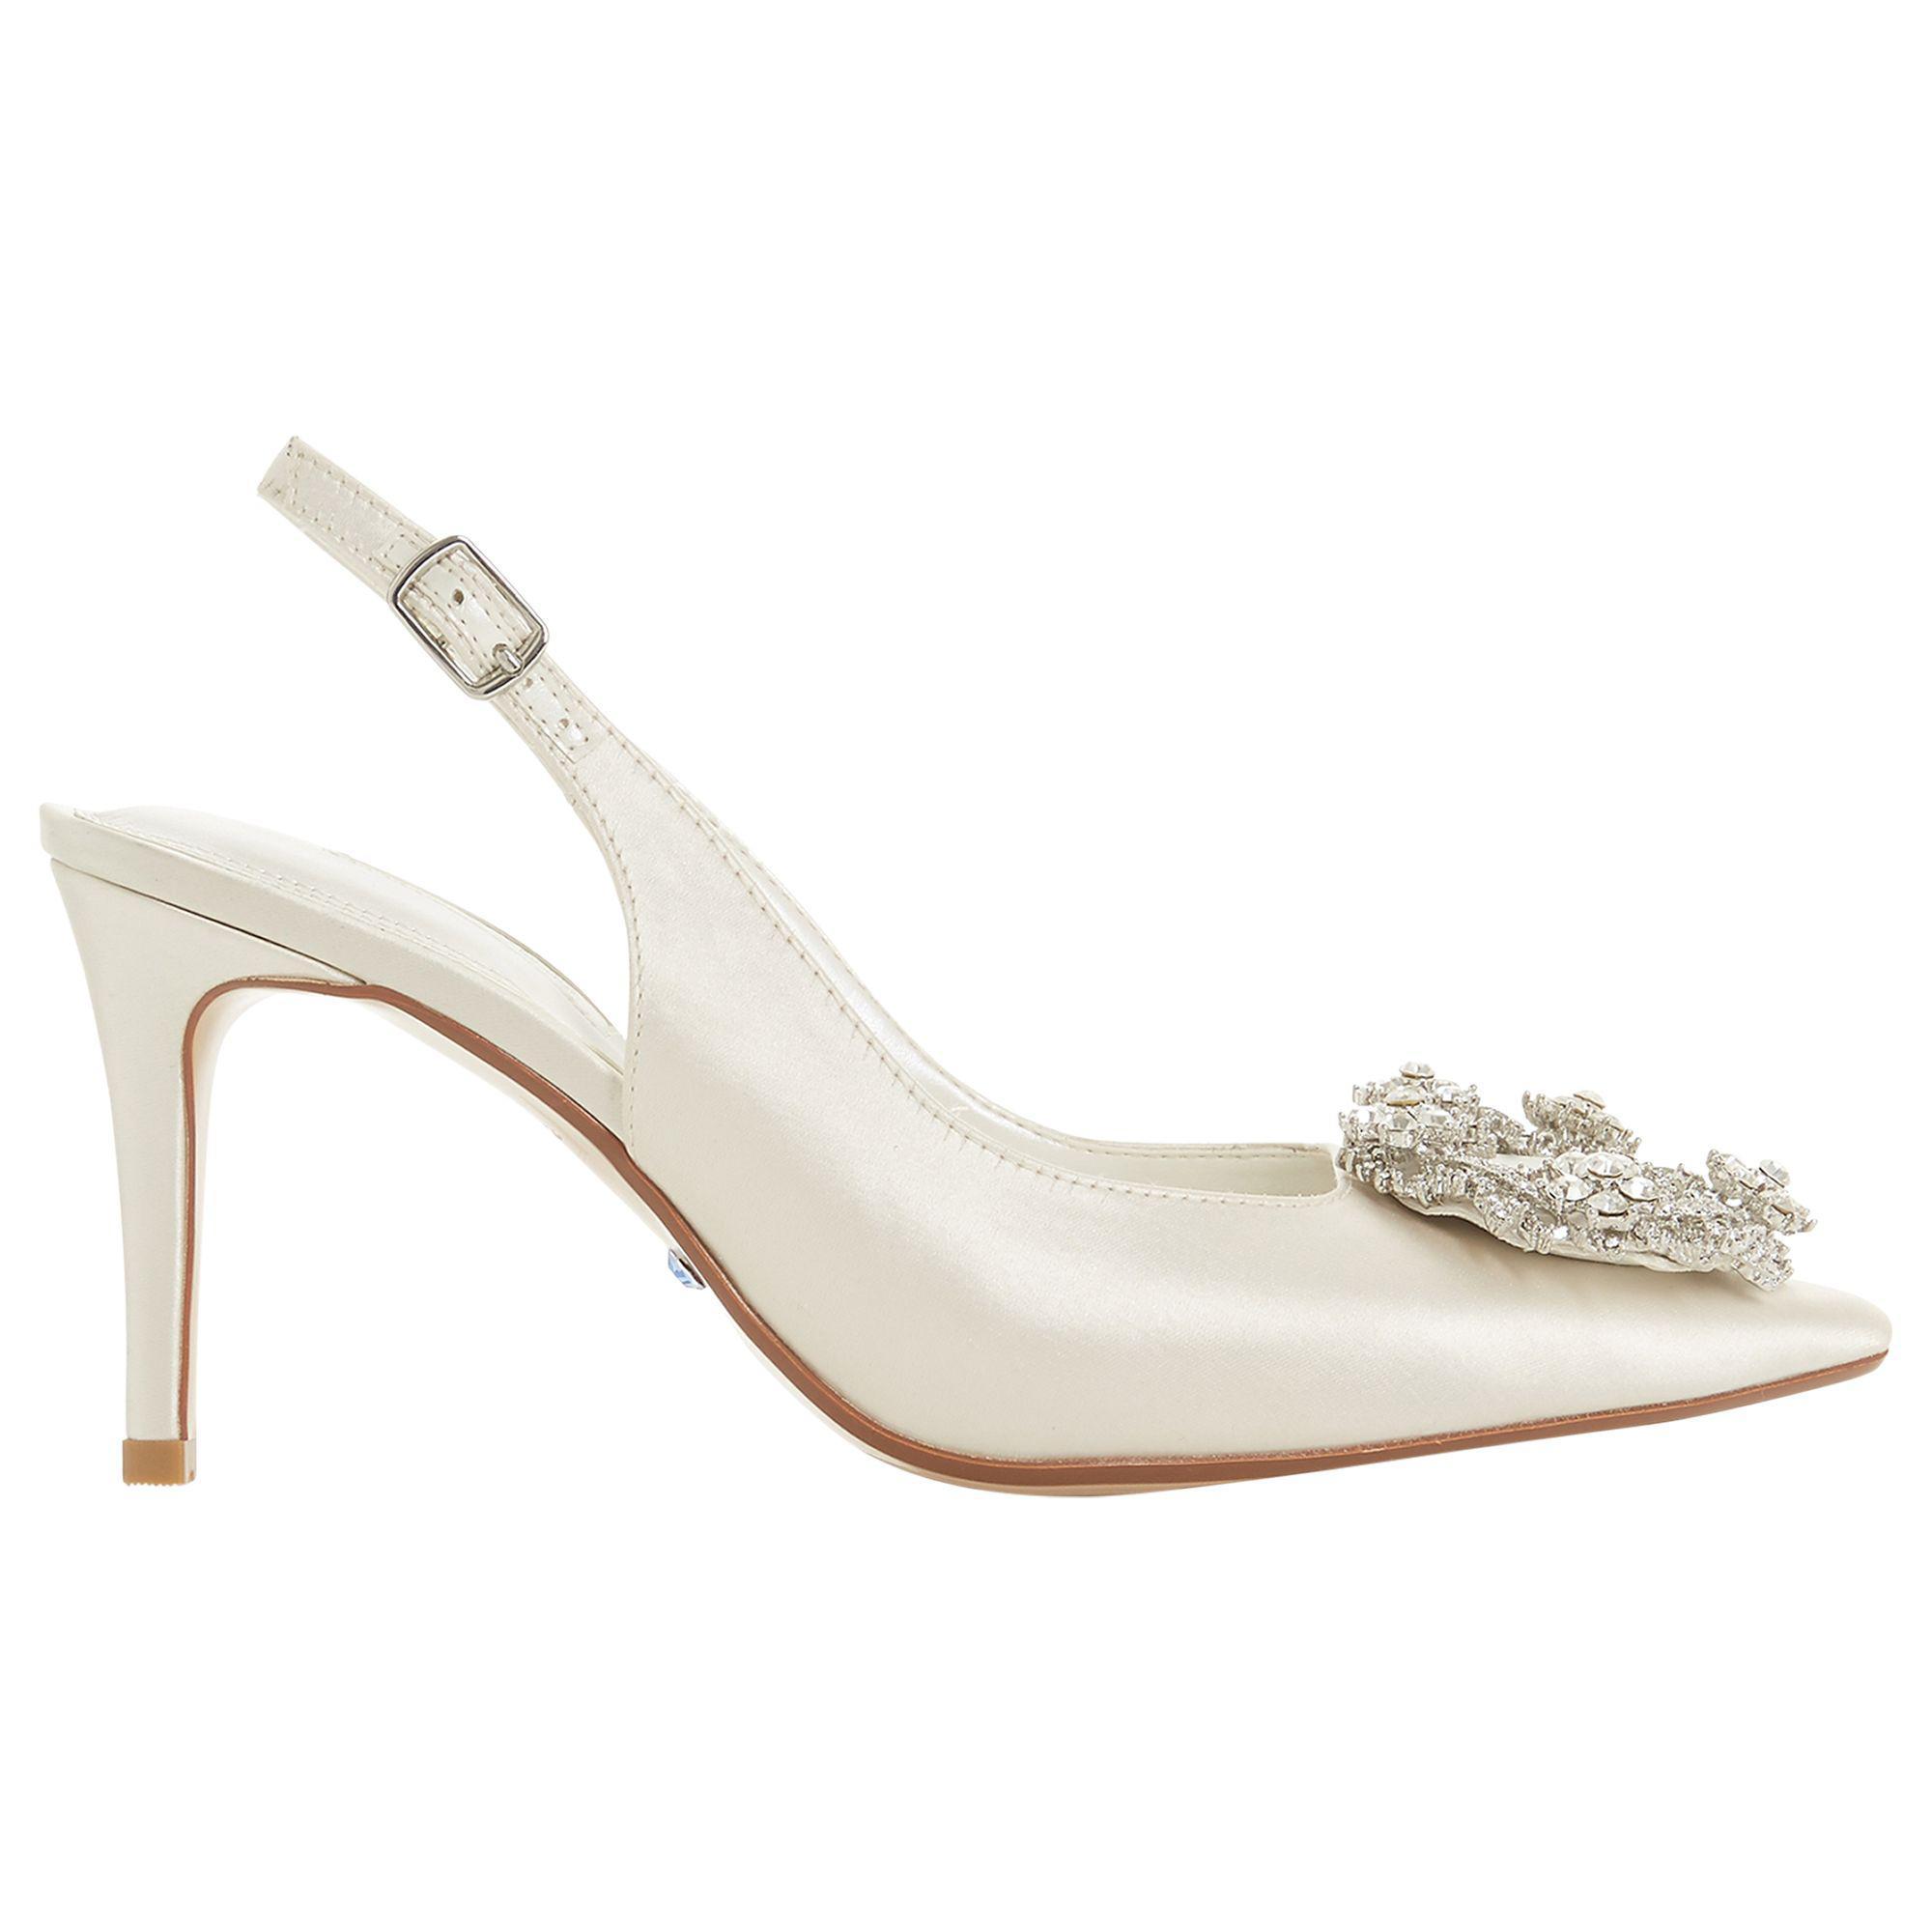 5787c15baf80 Dune Bridal Collection Ceremony Wreath Brooch Slingback Court Shoes ...